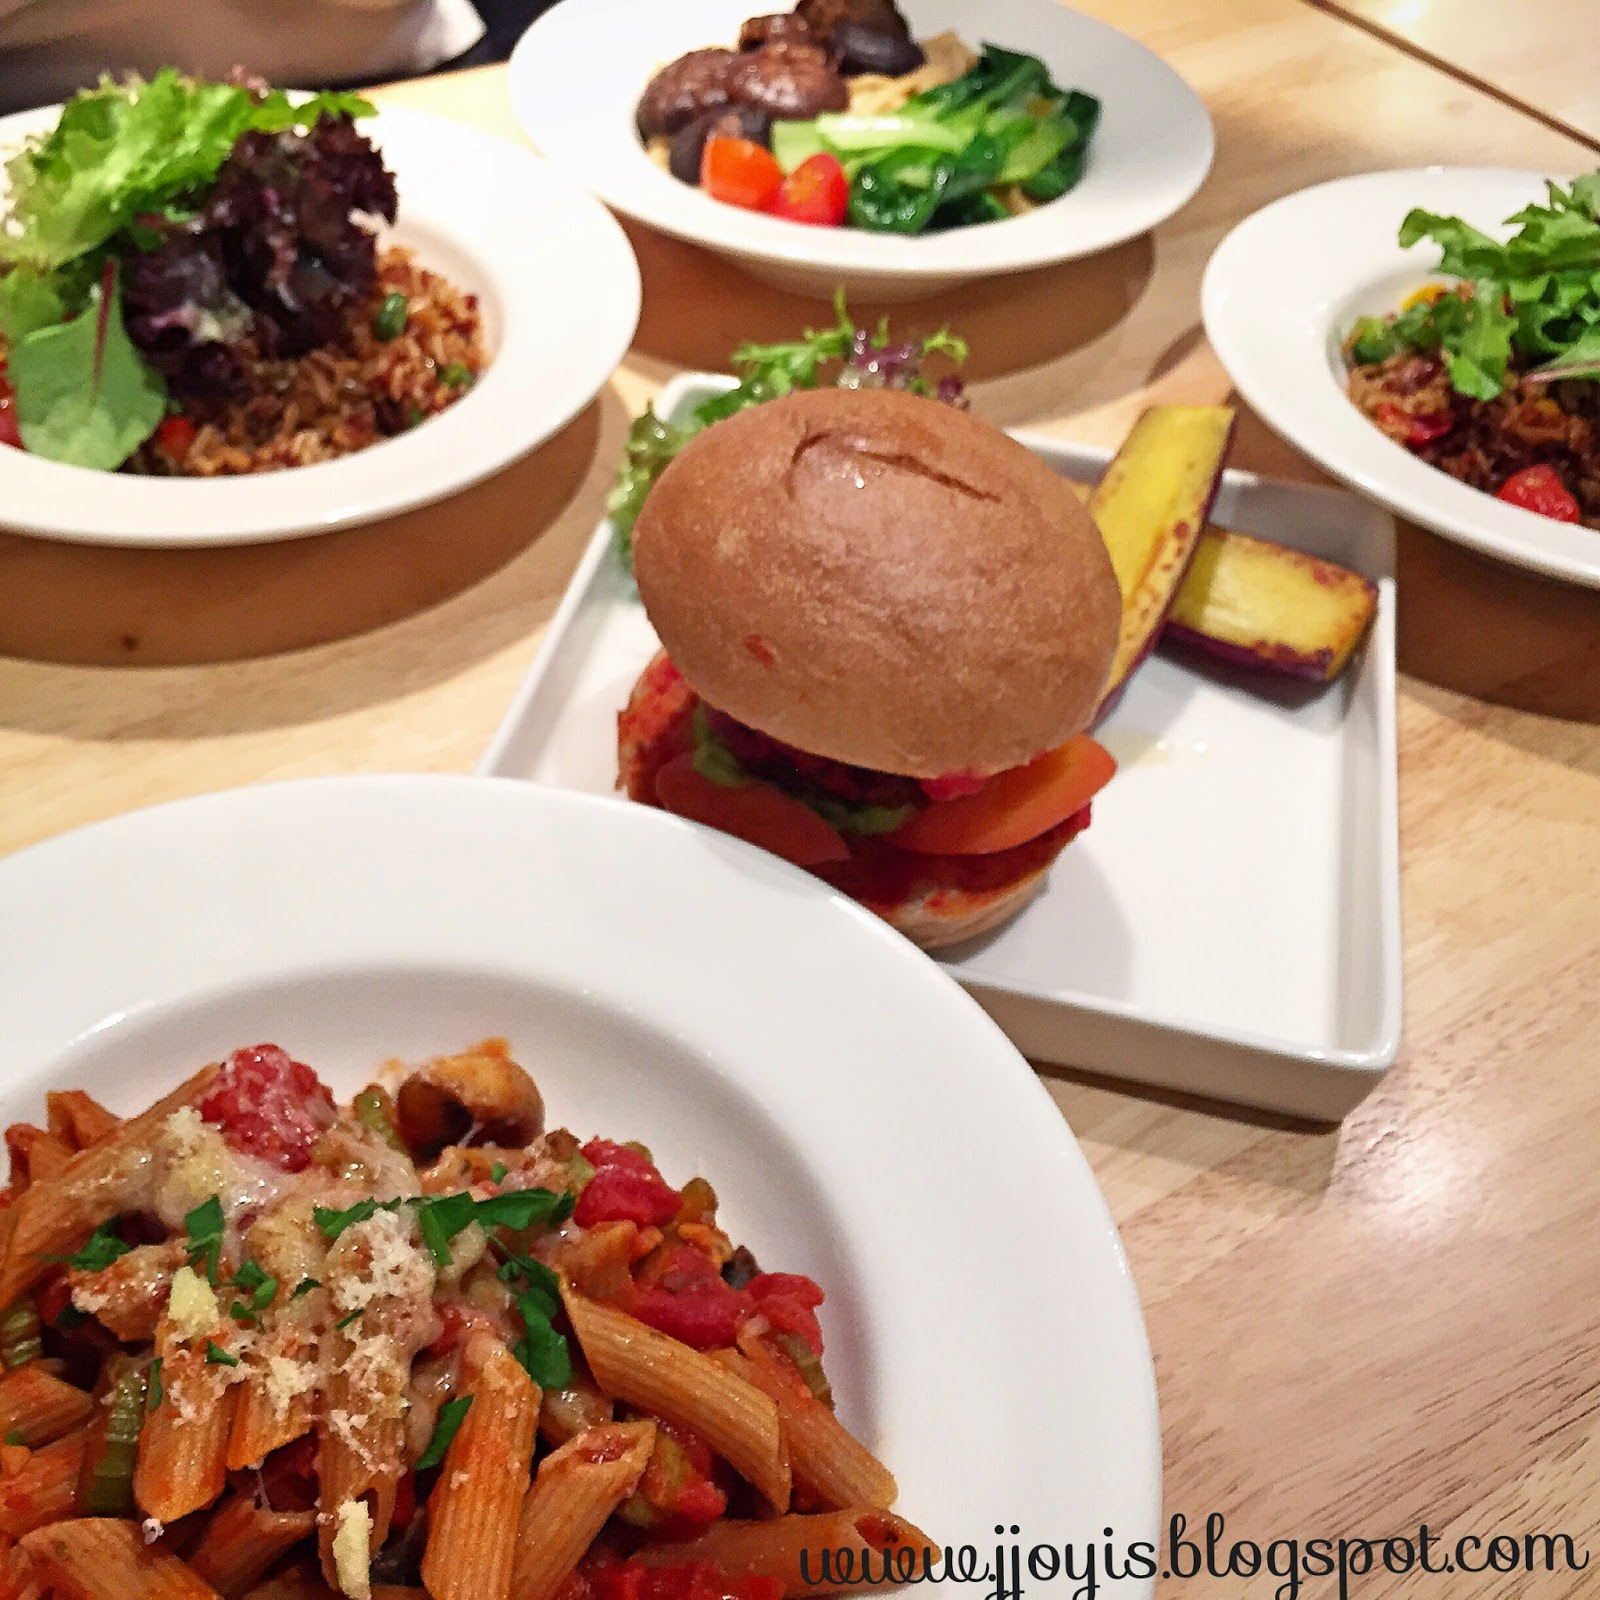 Food Real Food Square 2  jjoyis  Singapore beauty lifestyle and food blog